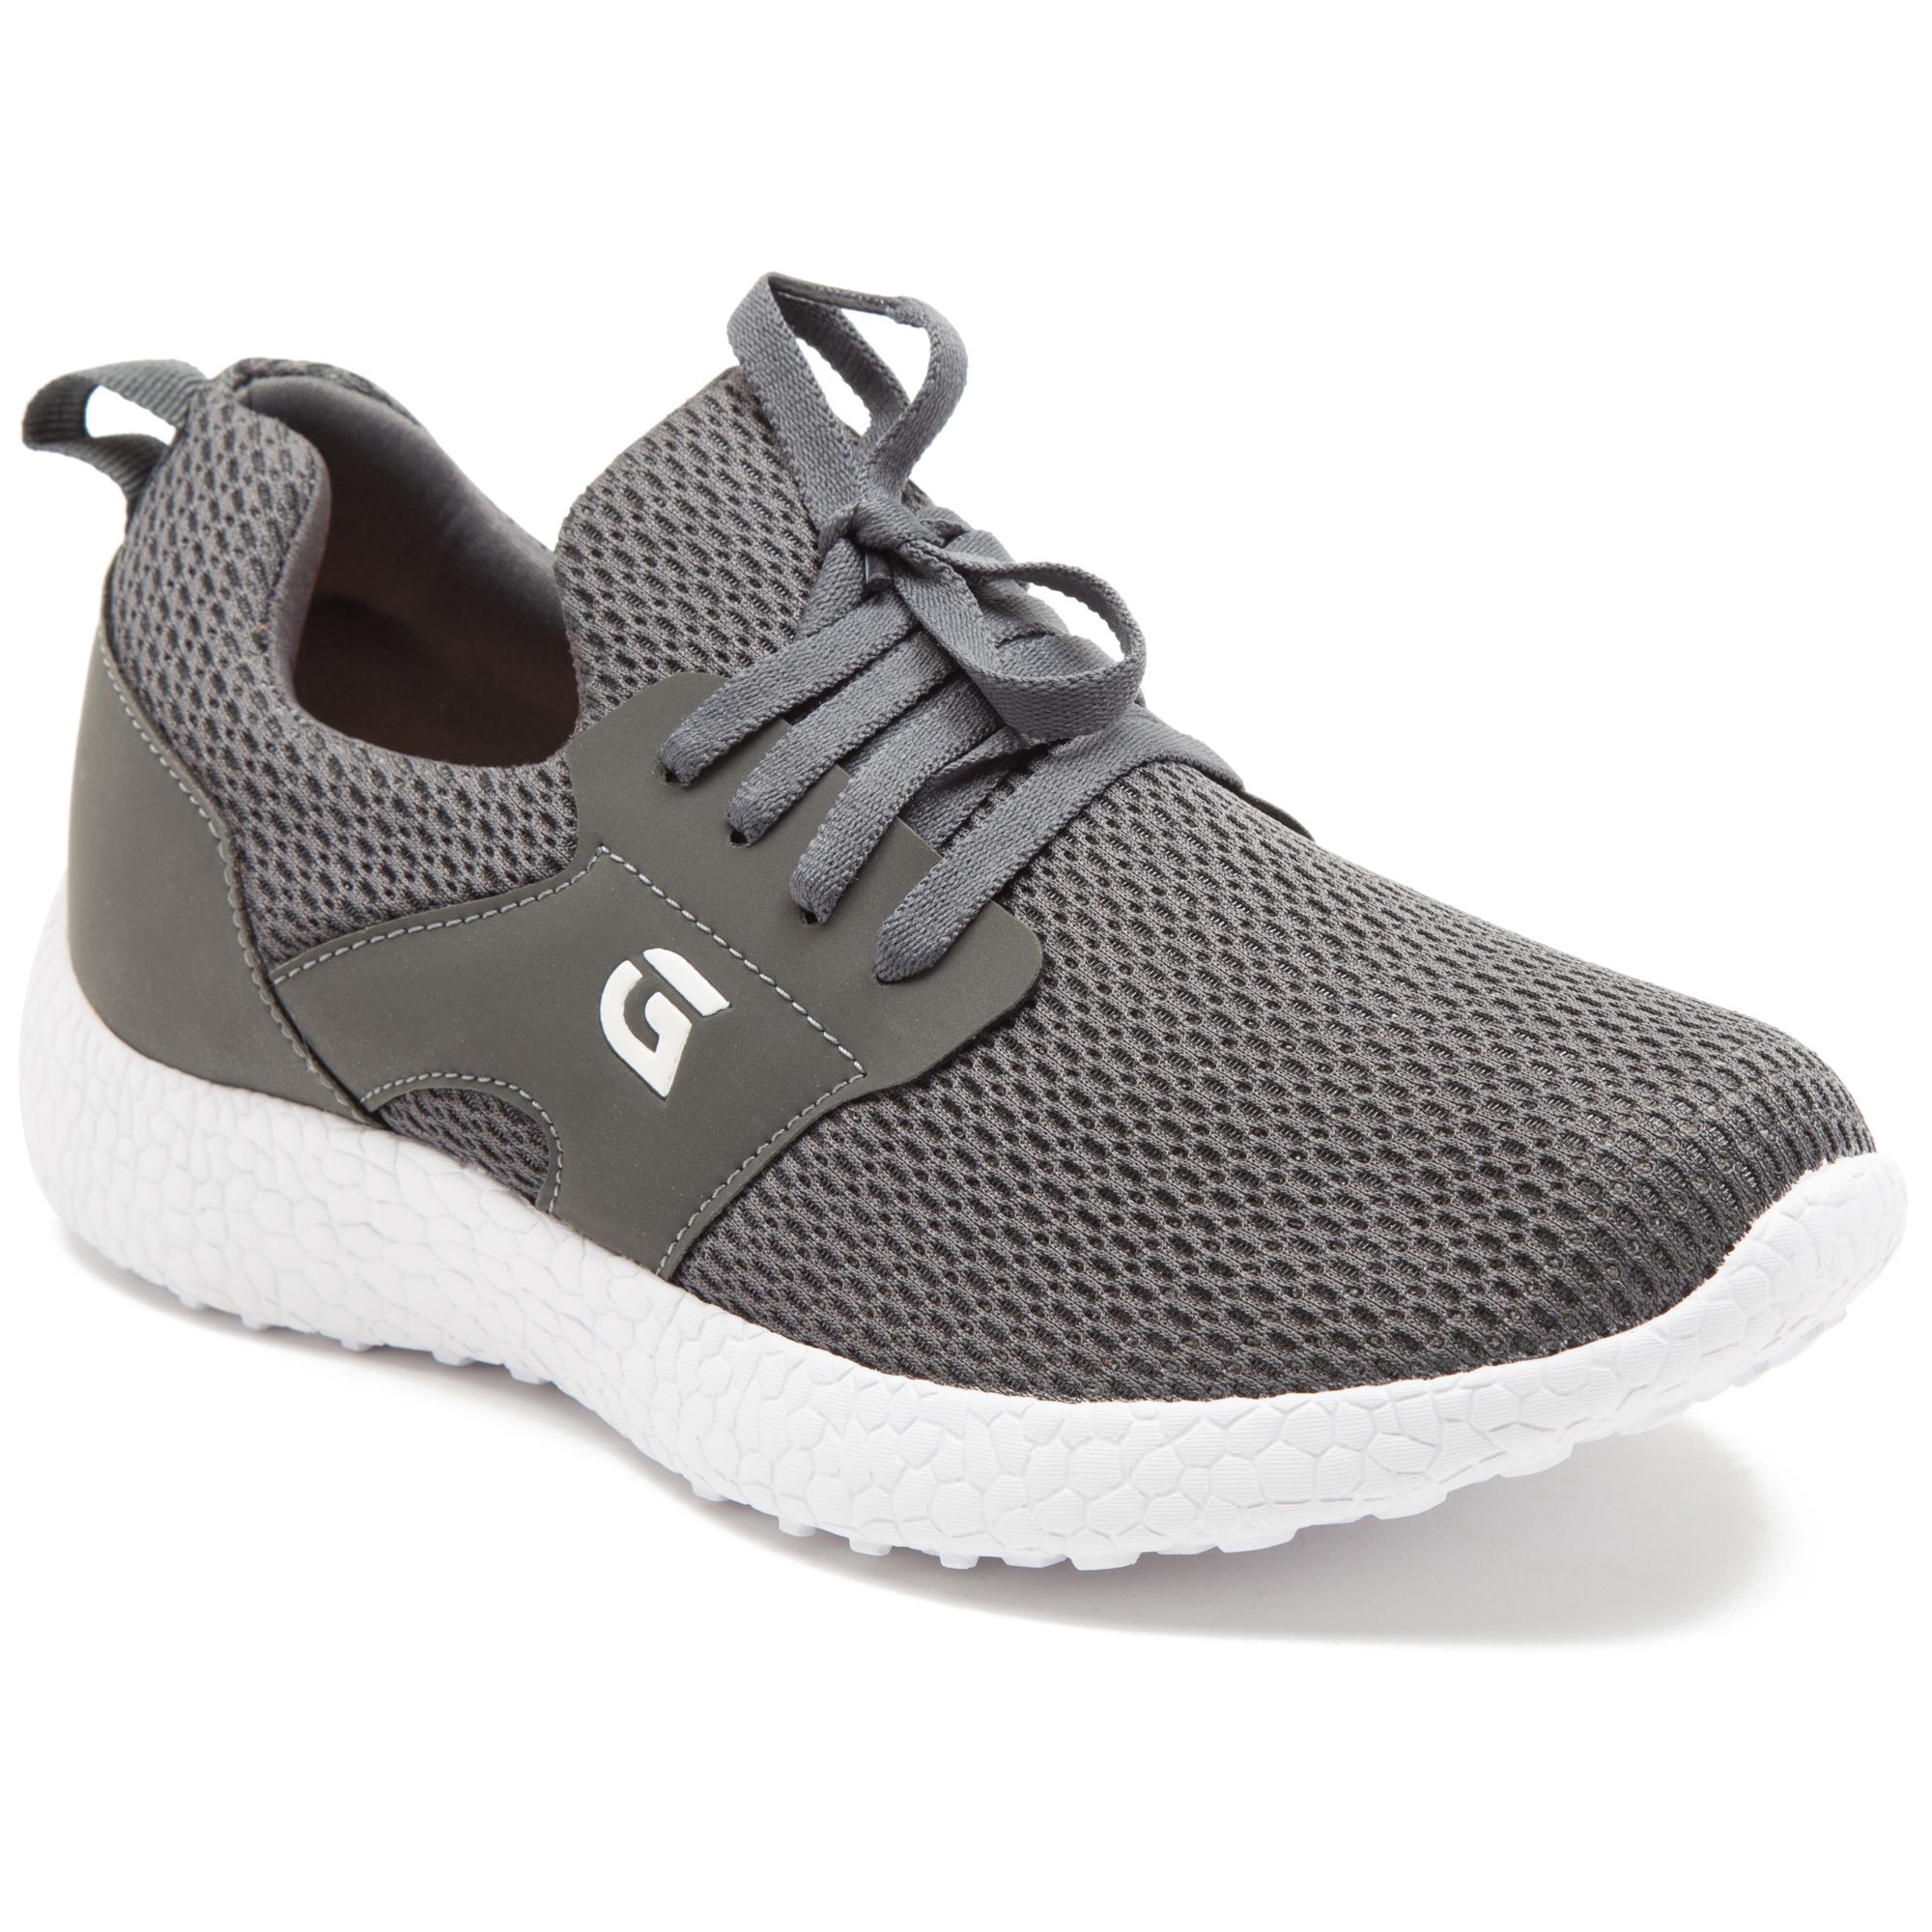 GANUCHI | Ganuchi by Franco Leone Women's Mesh Grey Running Shoes